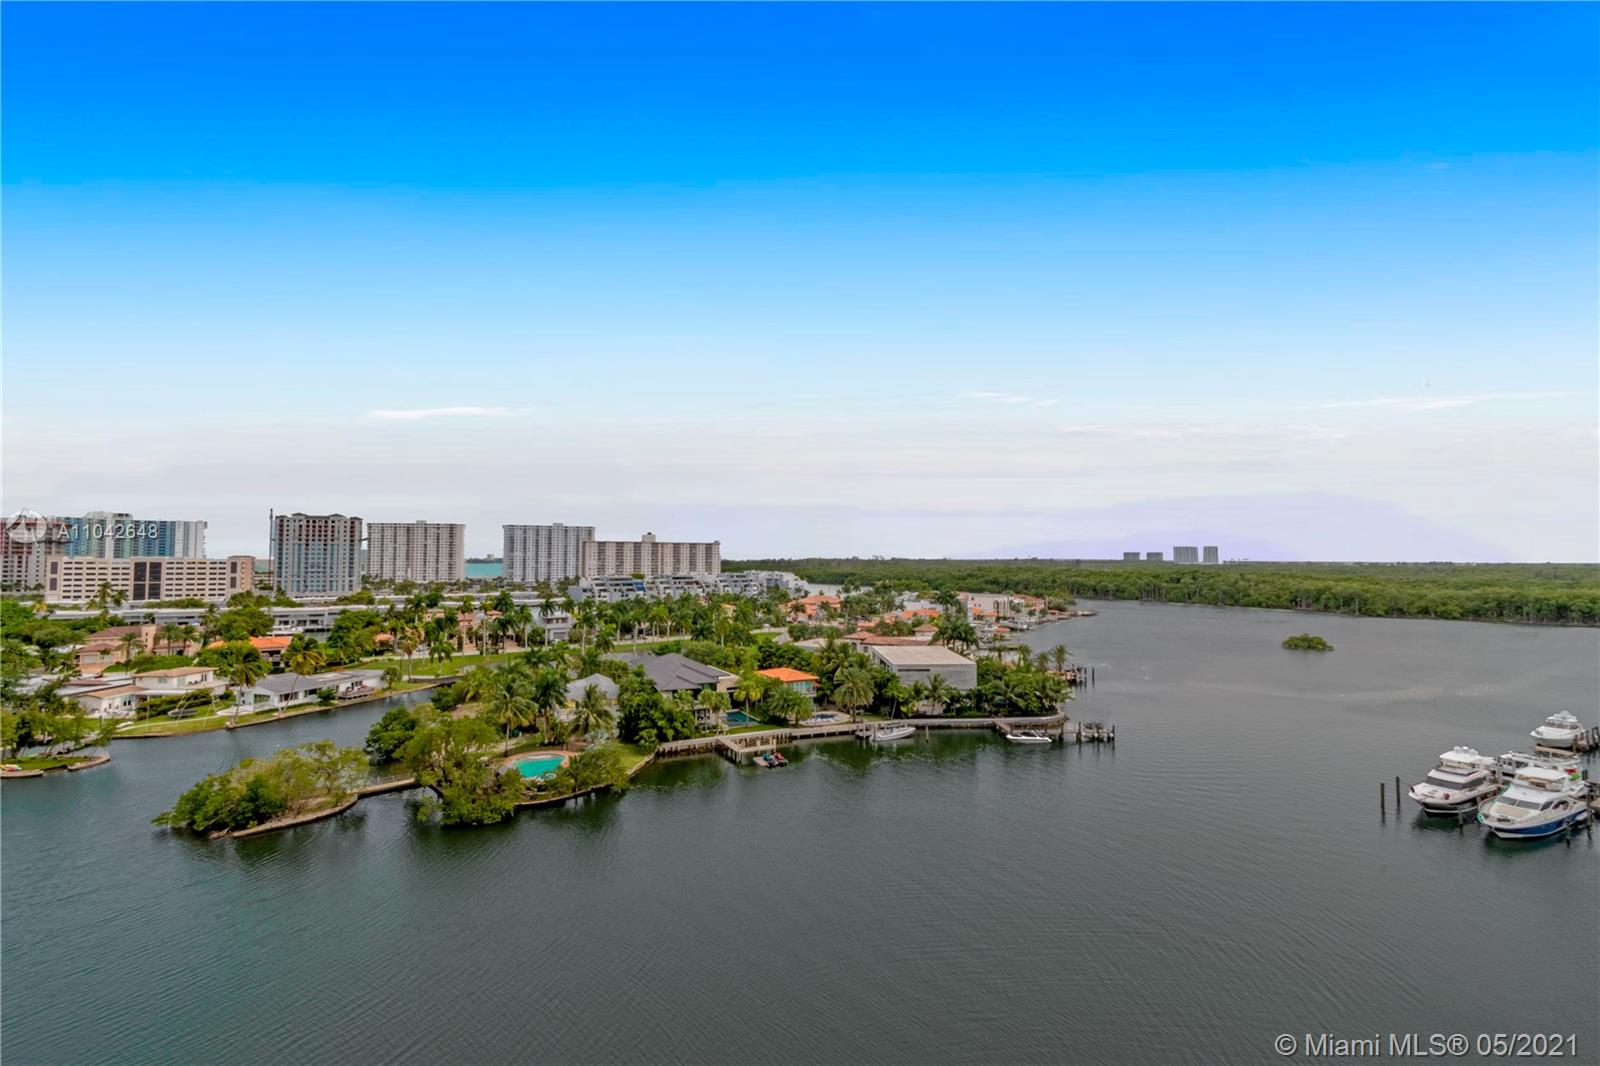 Parque Tower 2 #5-906 - 330 S Sunny Isles Blvd #5-906, Sunny Isles Beach, FL 33160